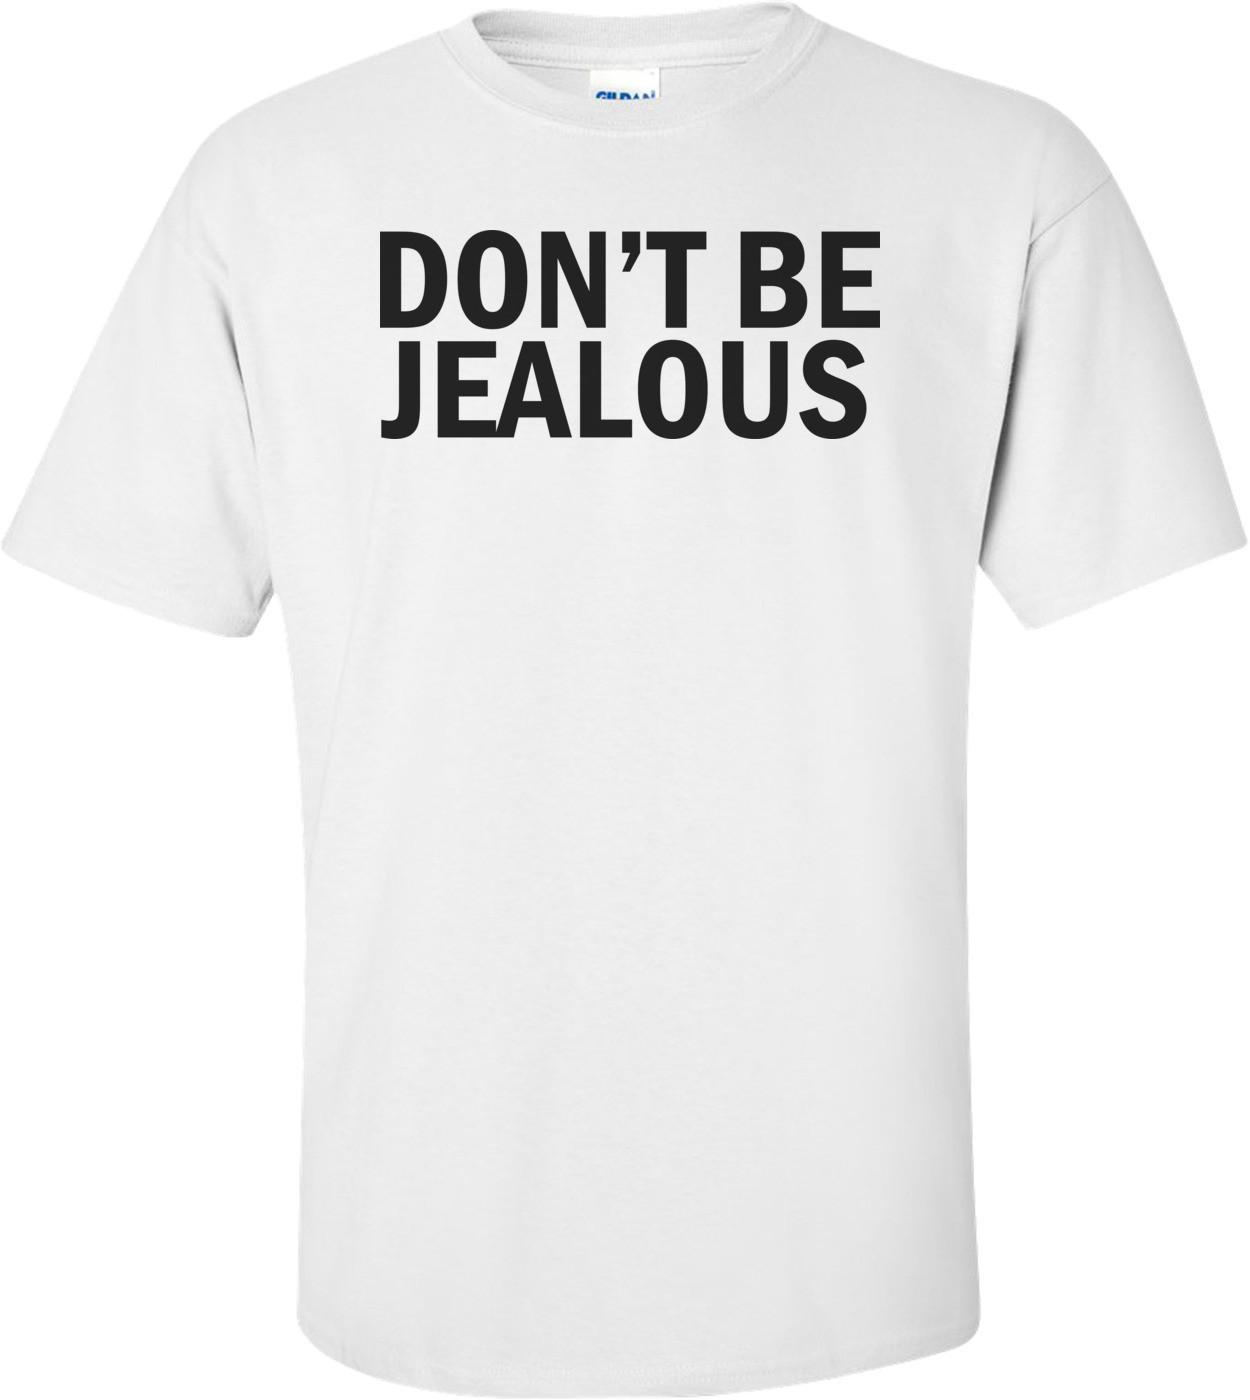 Don't Be Jealous Funny Shirt